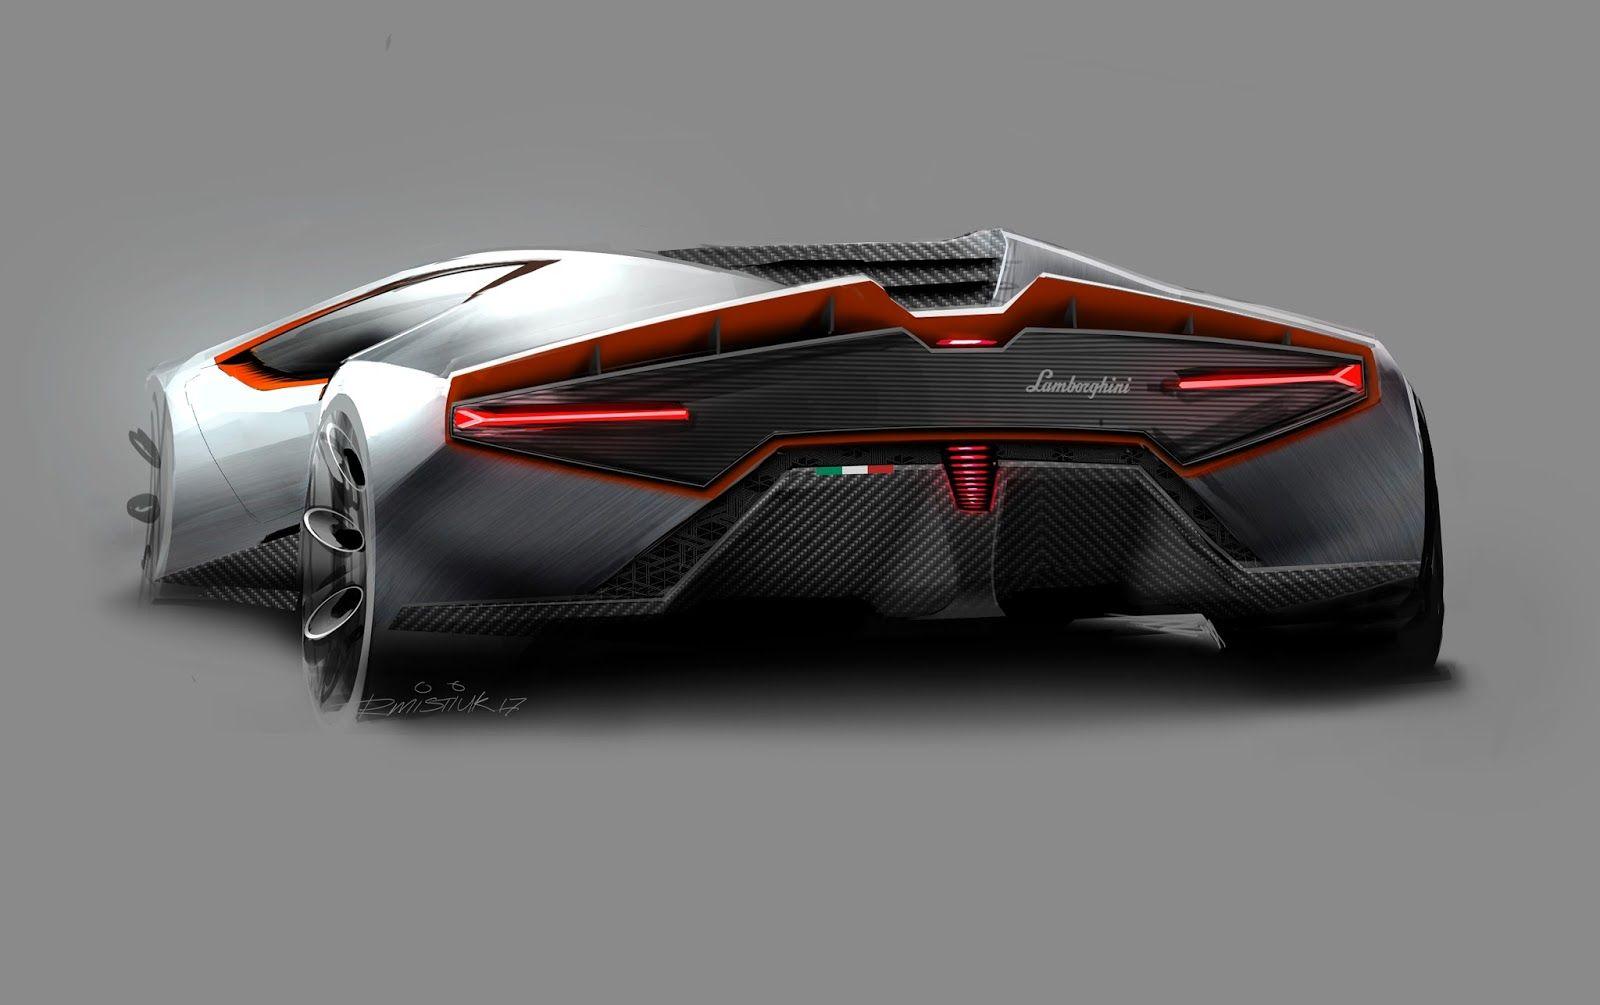 Lambo Copy Jpg 1 600 1 005 Pixels With Images Supercar Design Concept Cars Super Cars